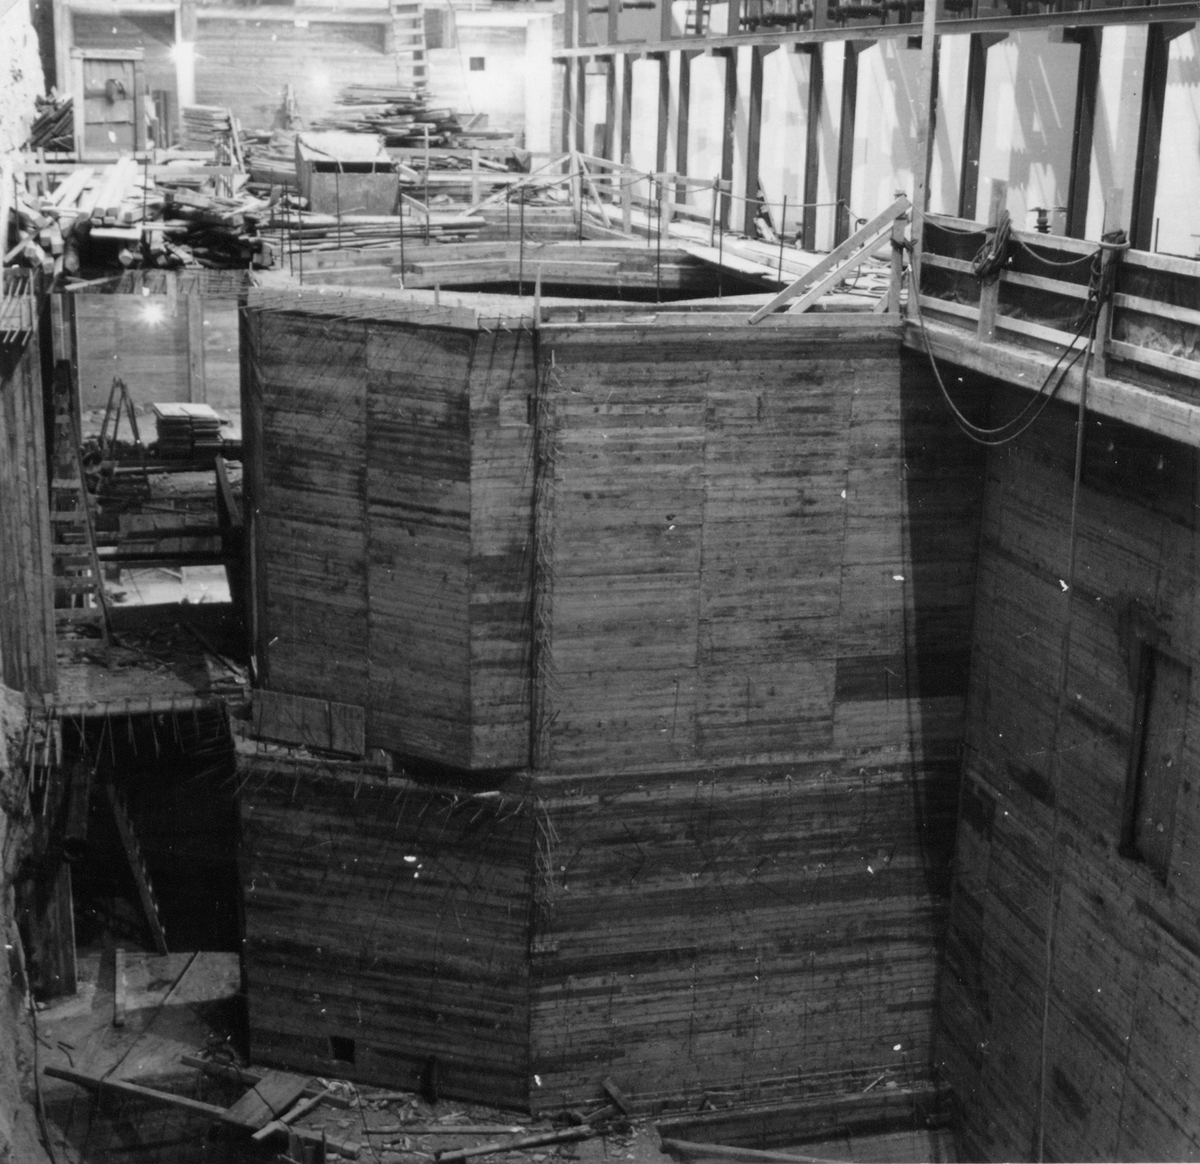 Gruve for maskin I, generatorfundament, Tysso II kraftstasjon